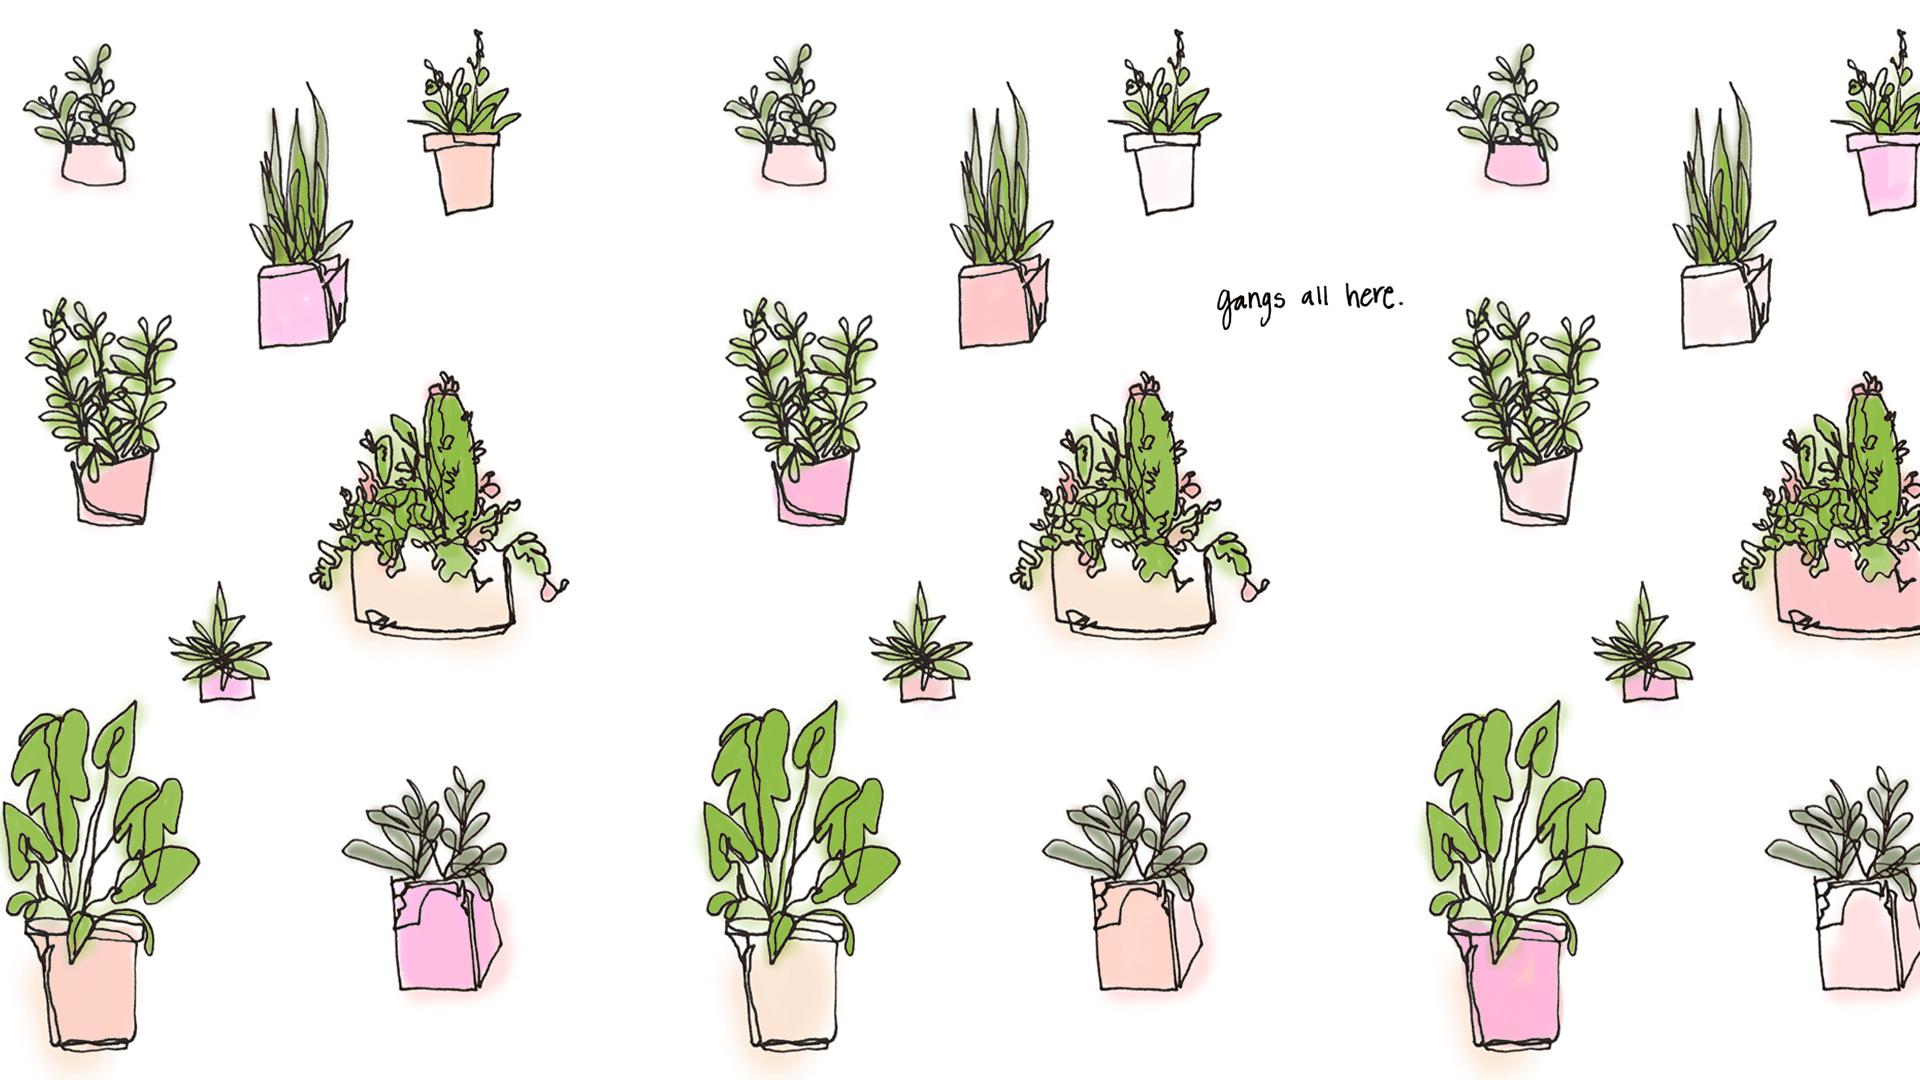 Emma's Greenery - Wallpaper